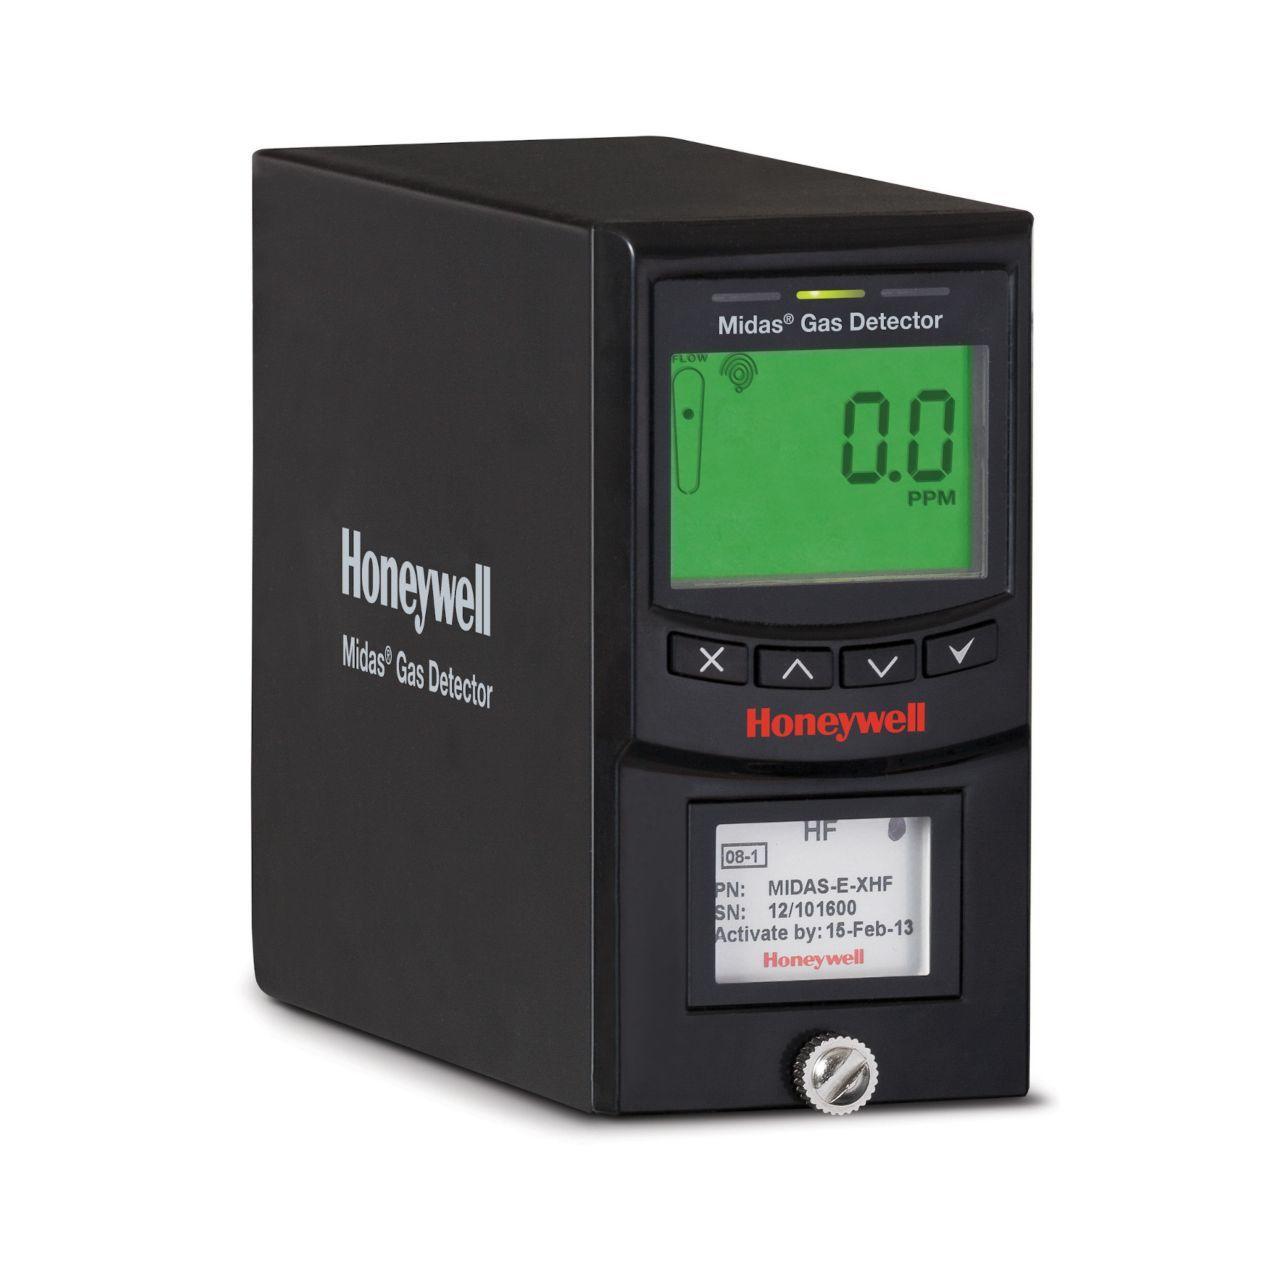 COX霍尼韦尔Midas气体探测器经销商_CO2半导体材料-南通市卡纳佳尔机械科技有限公司